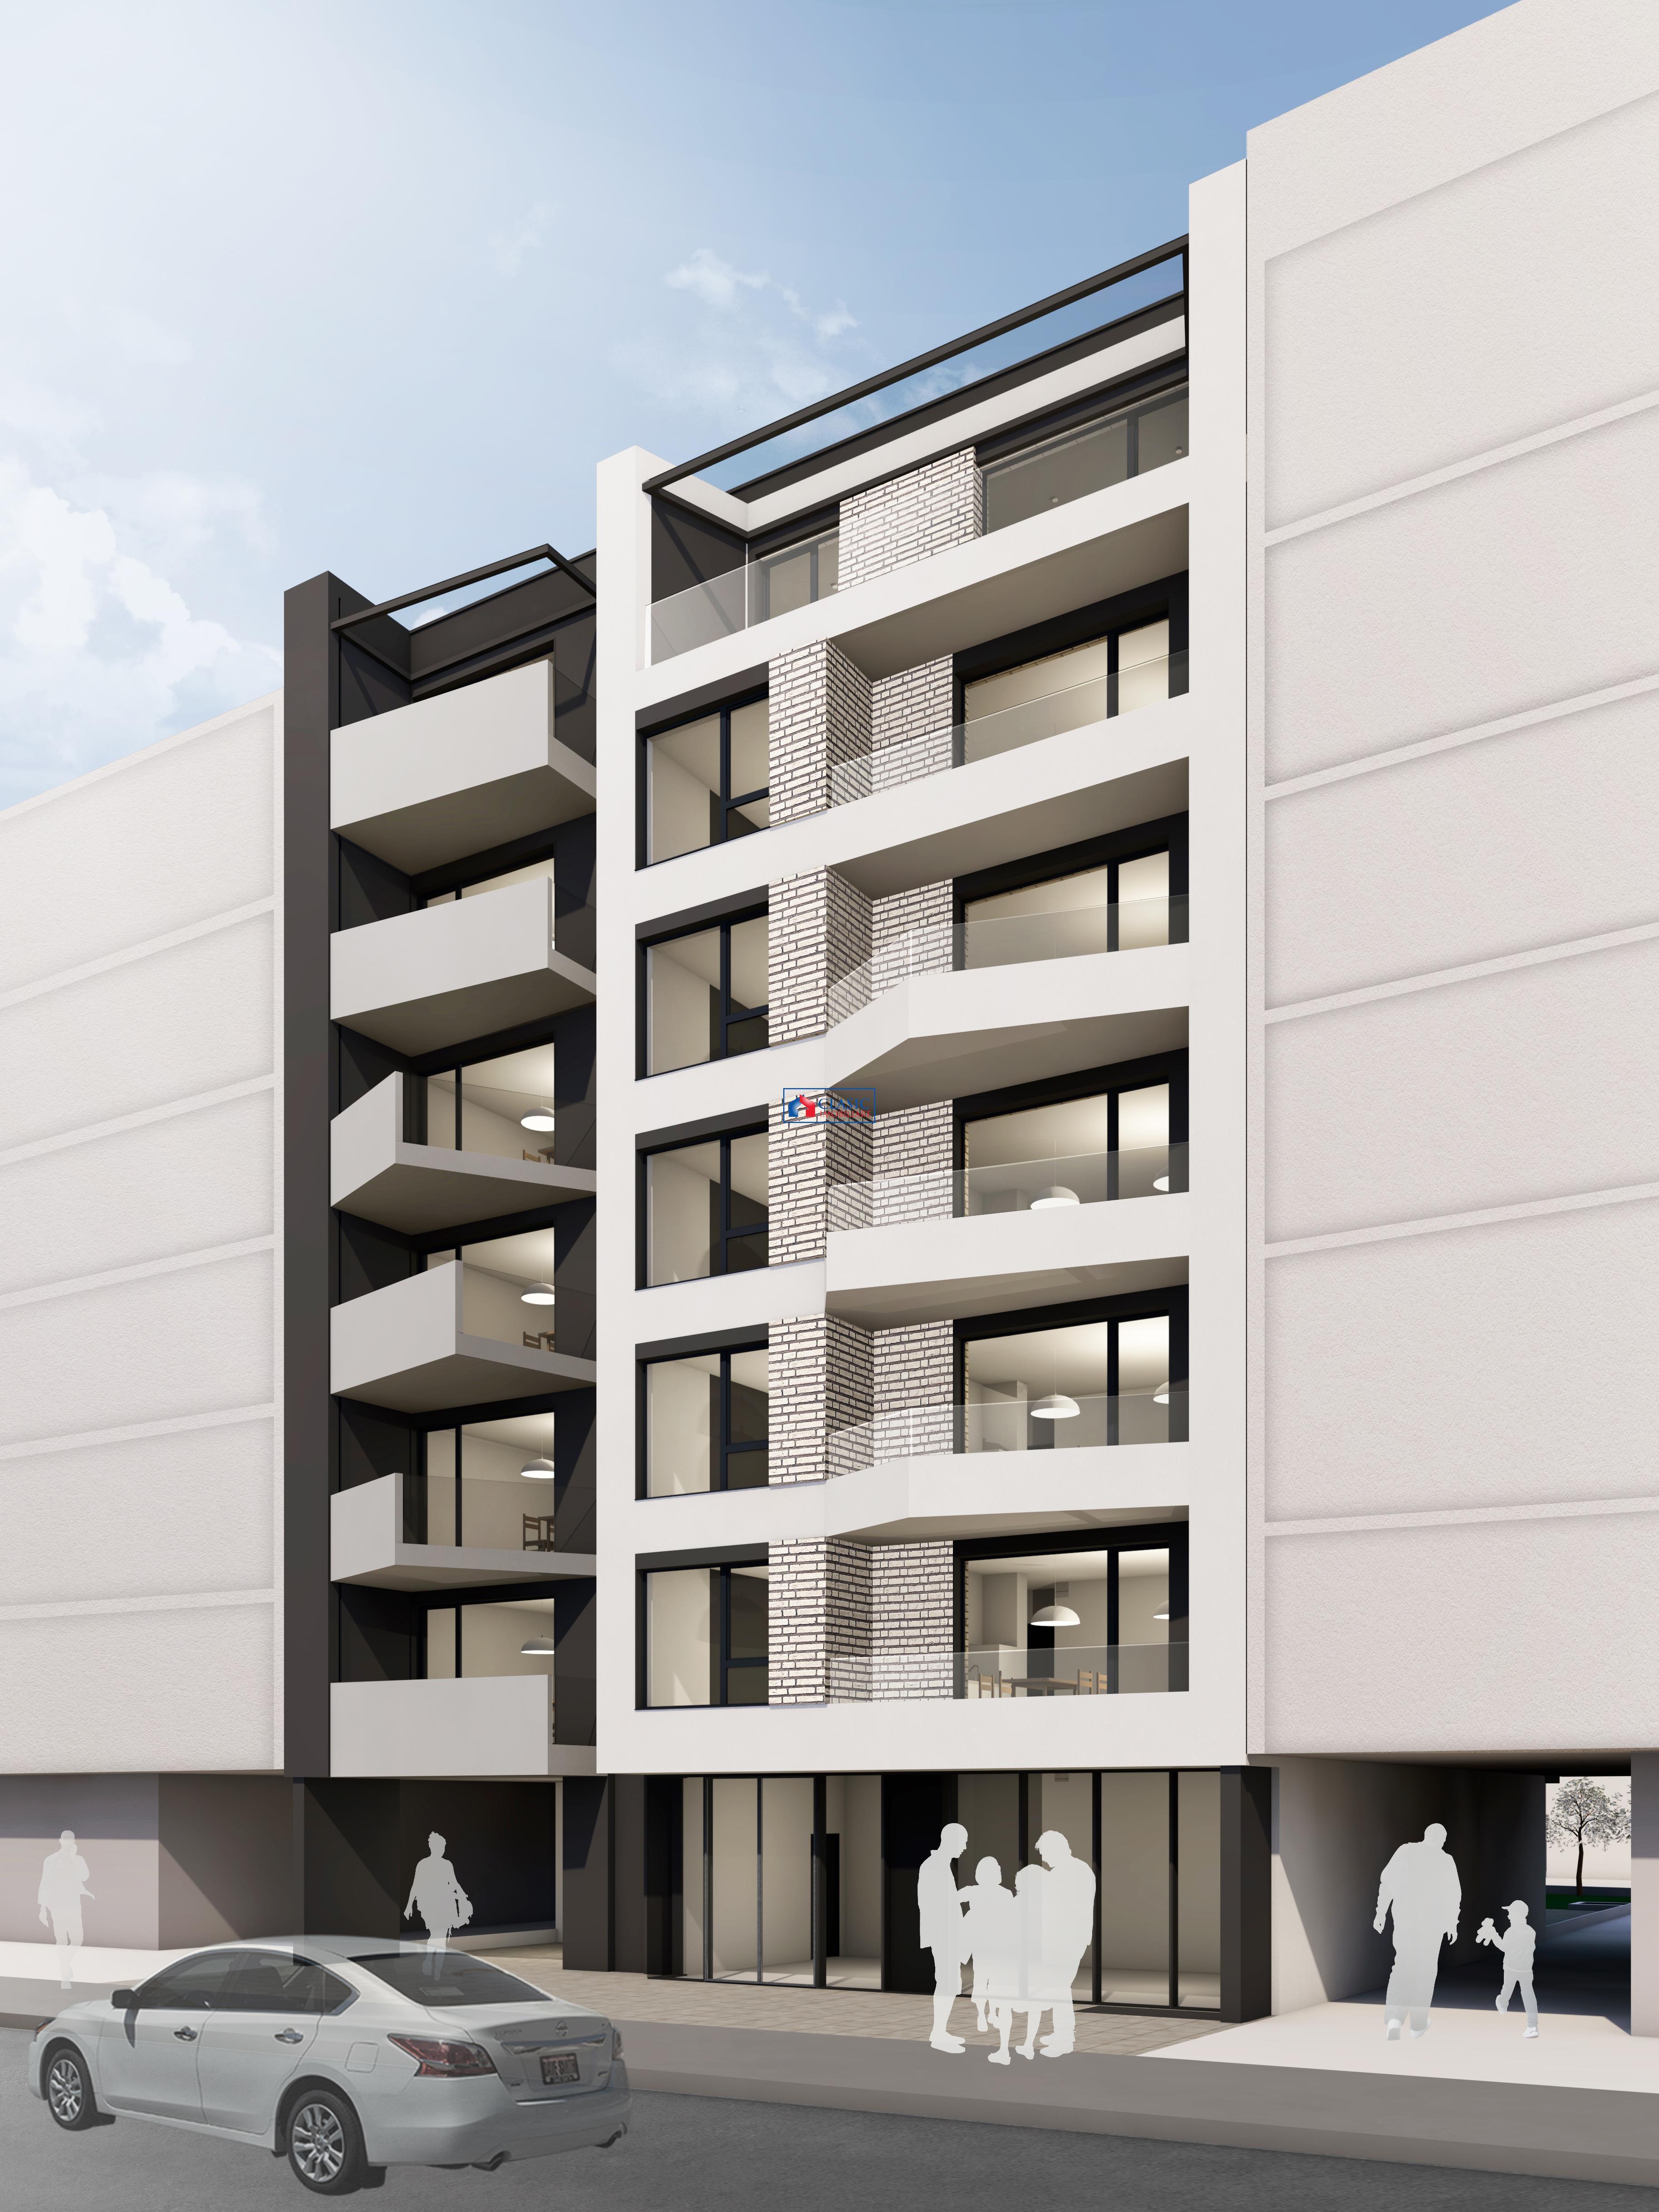 Vanzare Apartament 2 camere Gheorgheni zona Cipariu, Cluj Napoca